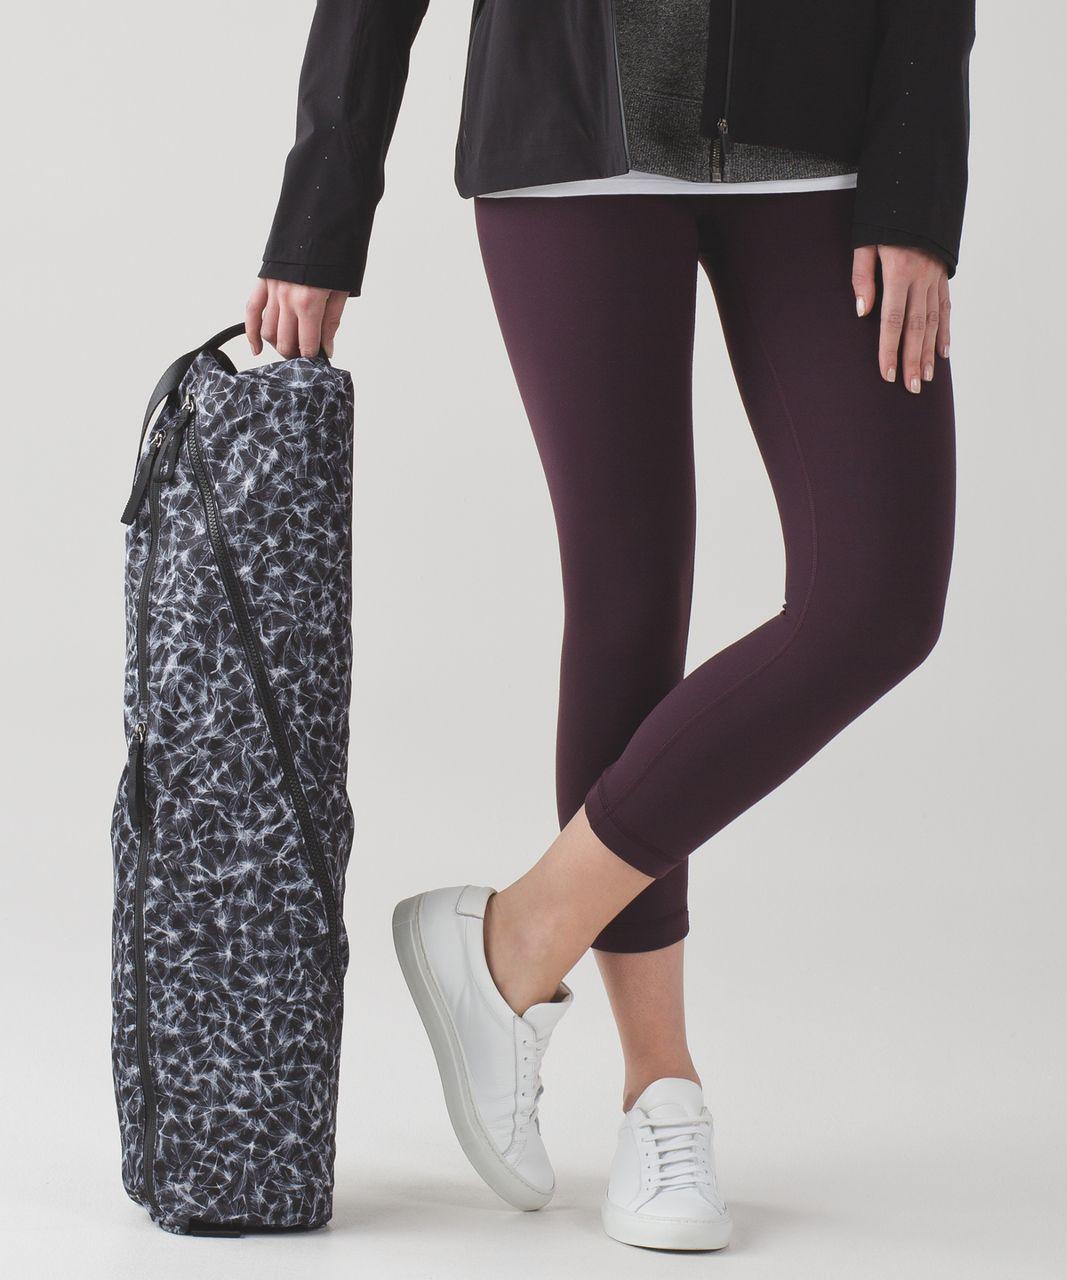 Lululemon The Yoga Bag